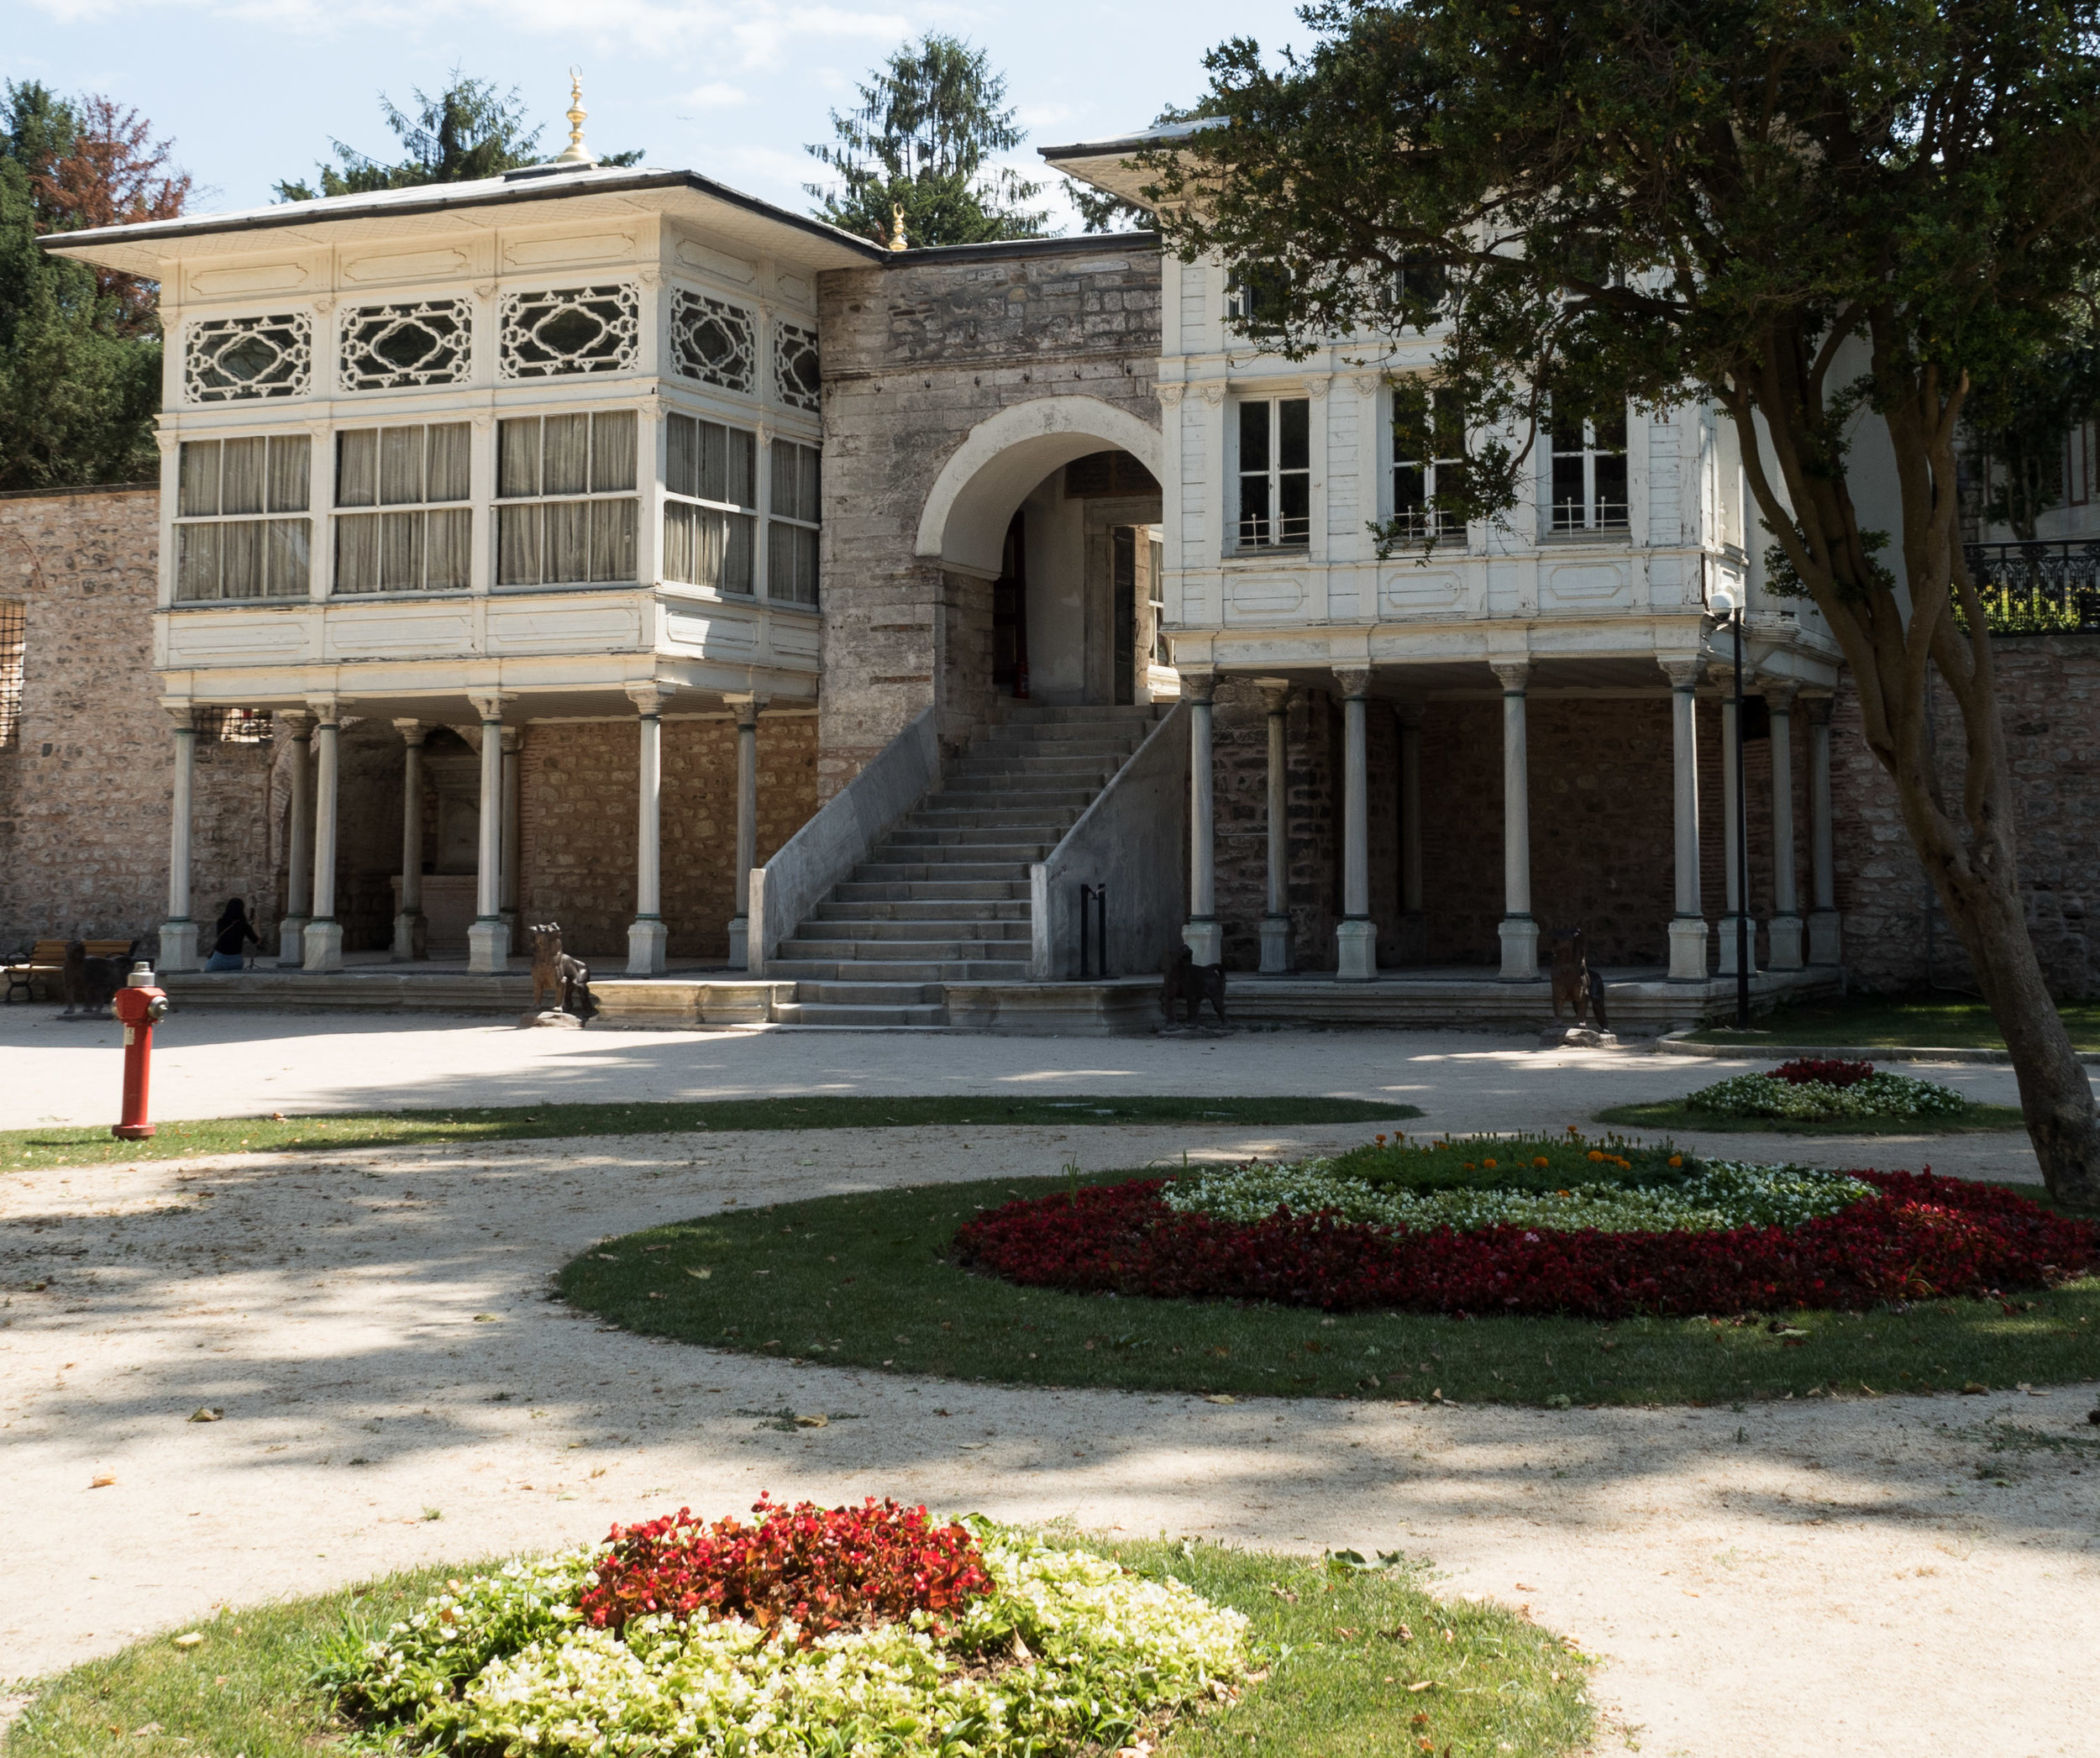 Mustafa Pasha's Kiosk Garden Side